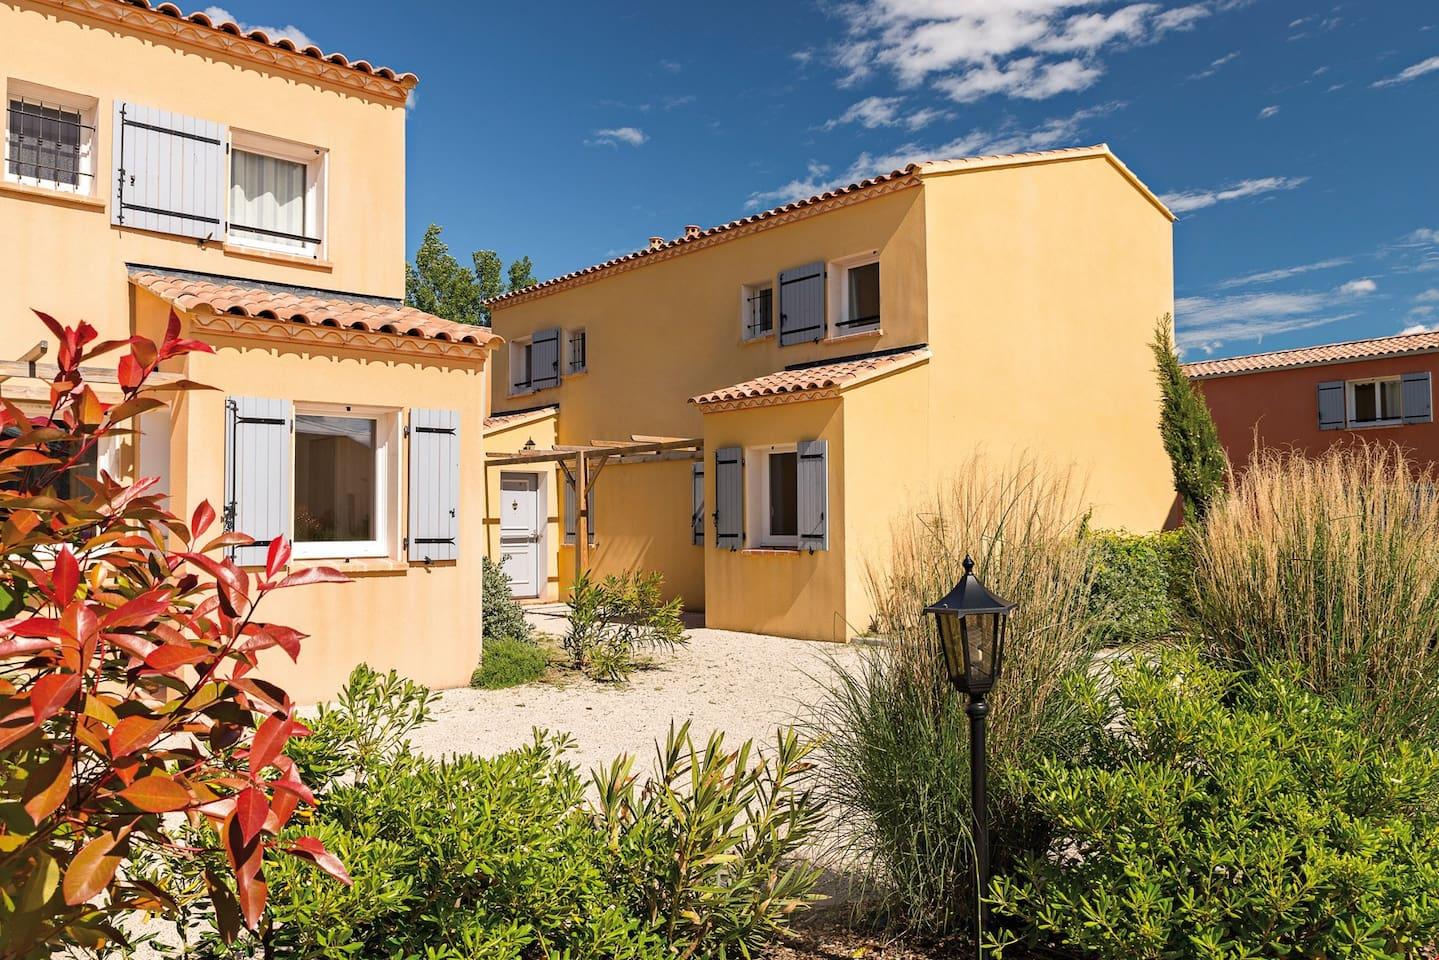 Welcome to Lagrange Vacances Residence L'Oustau de Sorgue!